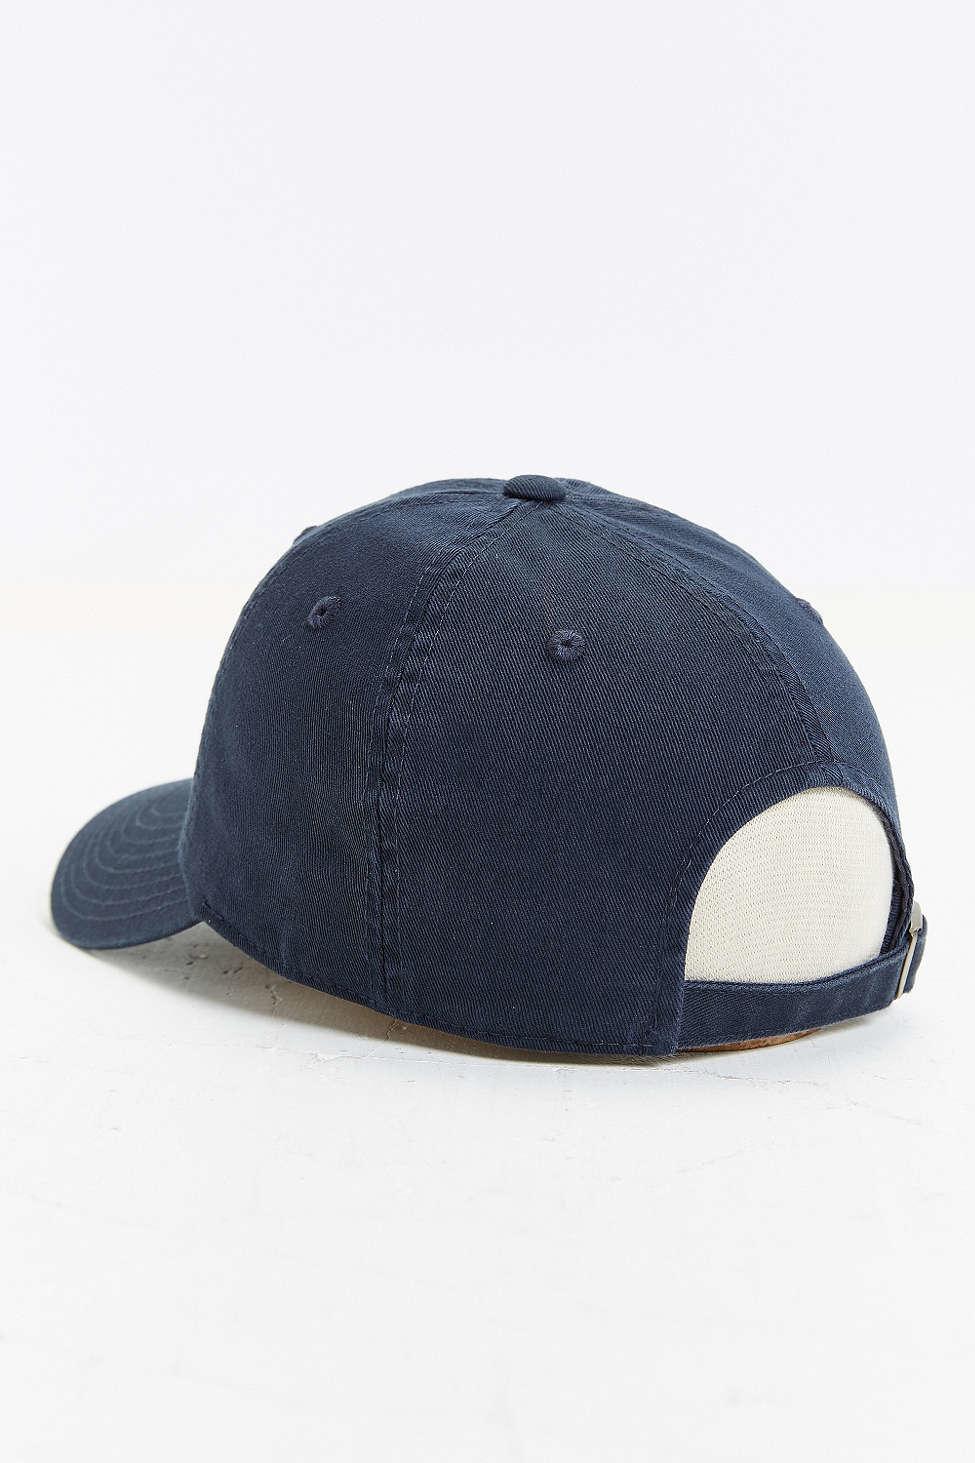 9ca658d7117 American Needle Ballpark Baseball Hat in Blue for Men - Lyst